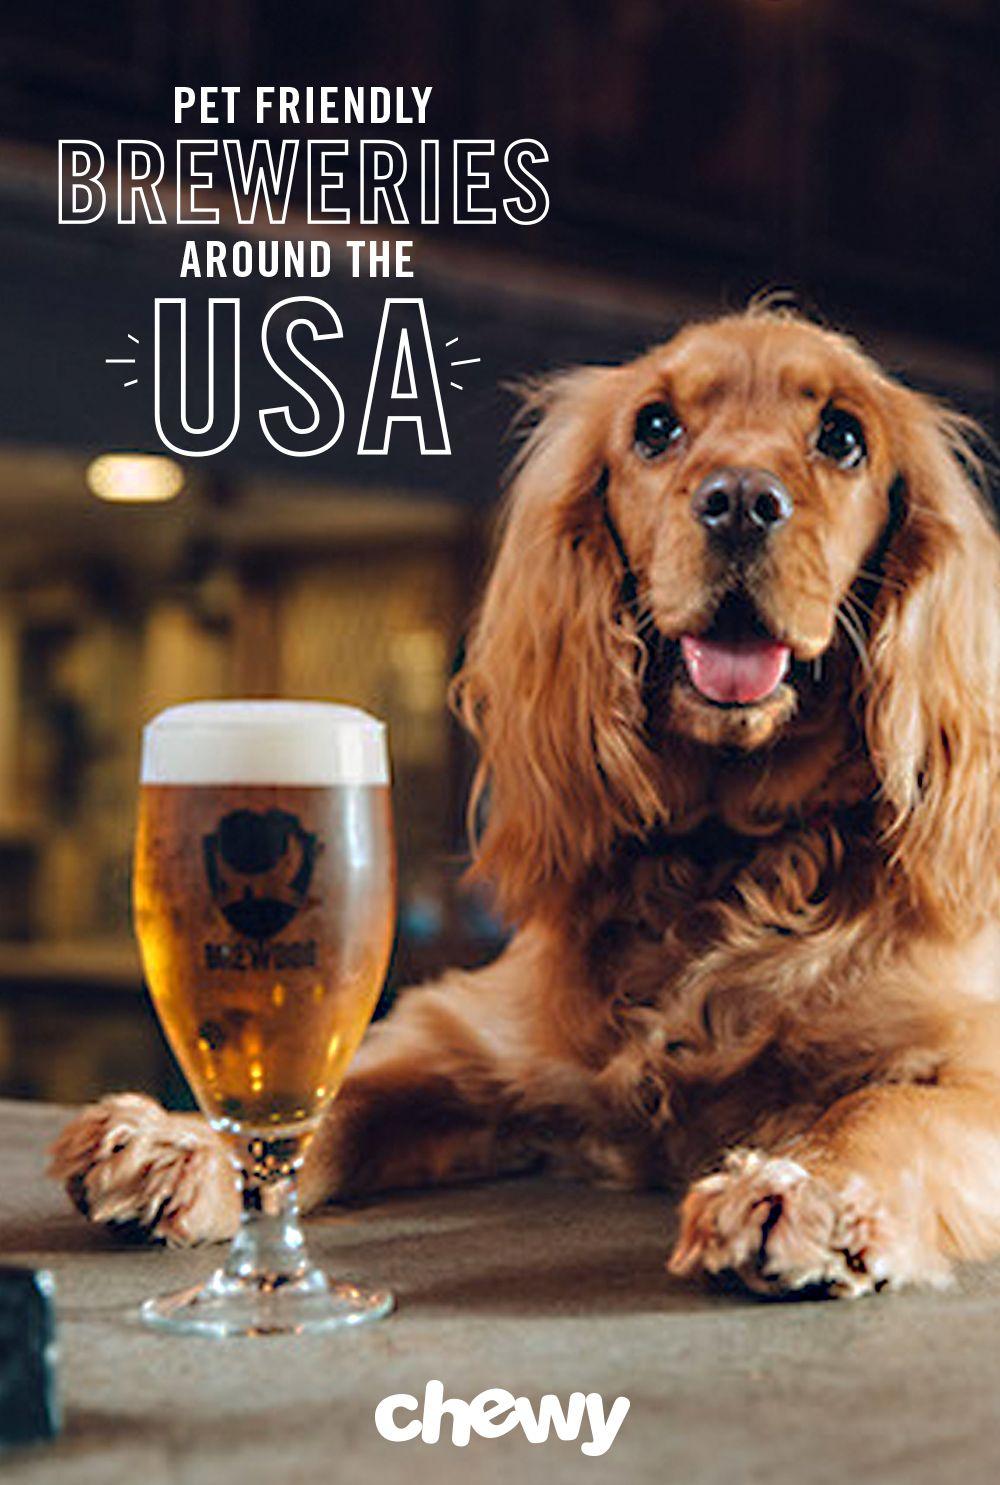 10 DogFriendly Breweries Dog friends, Great dane rescue